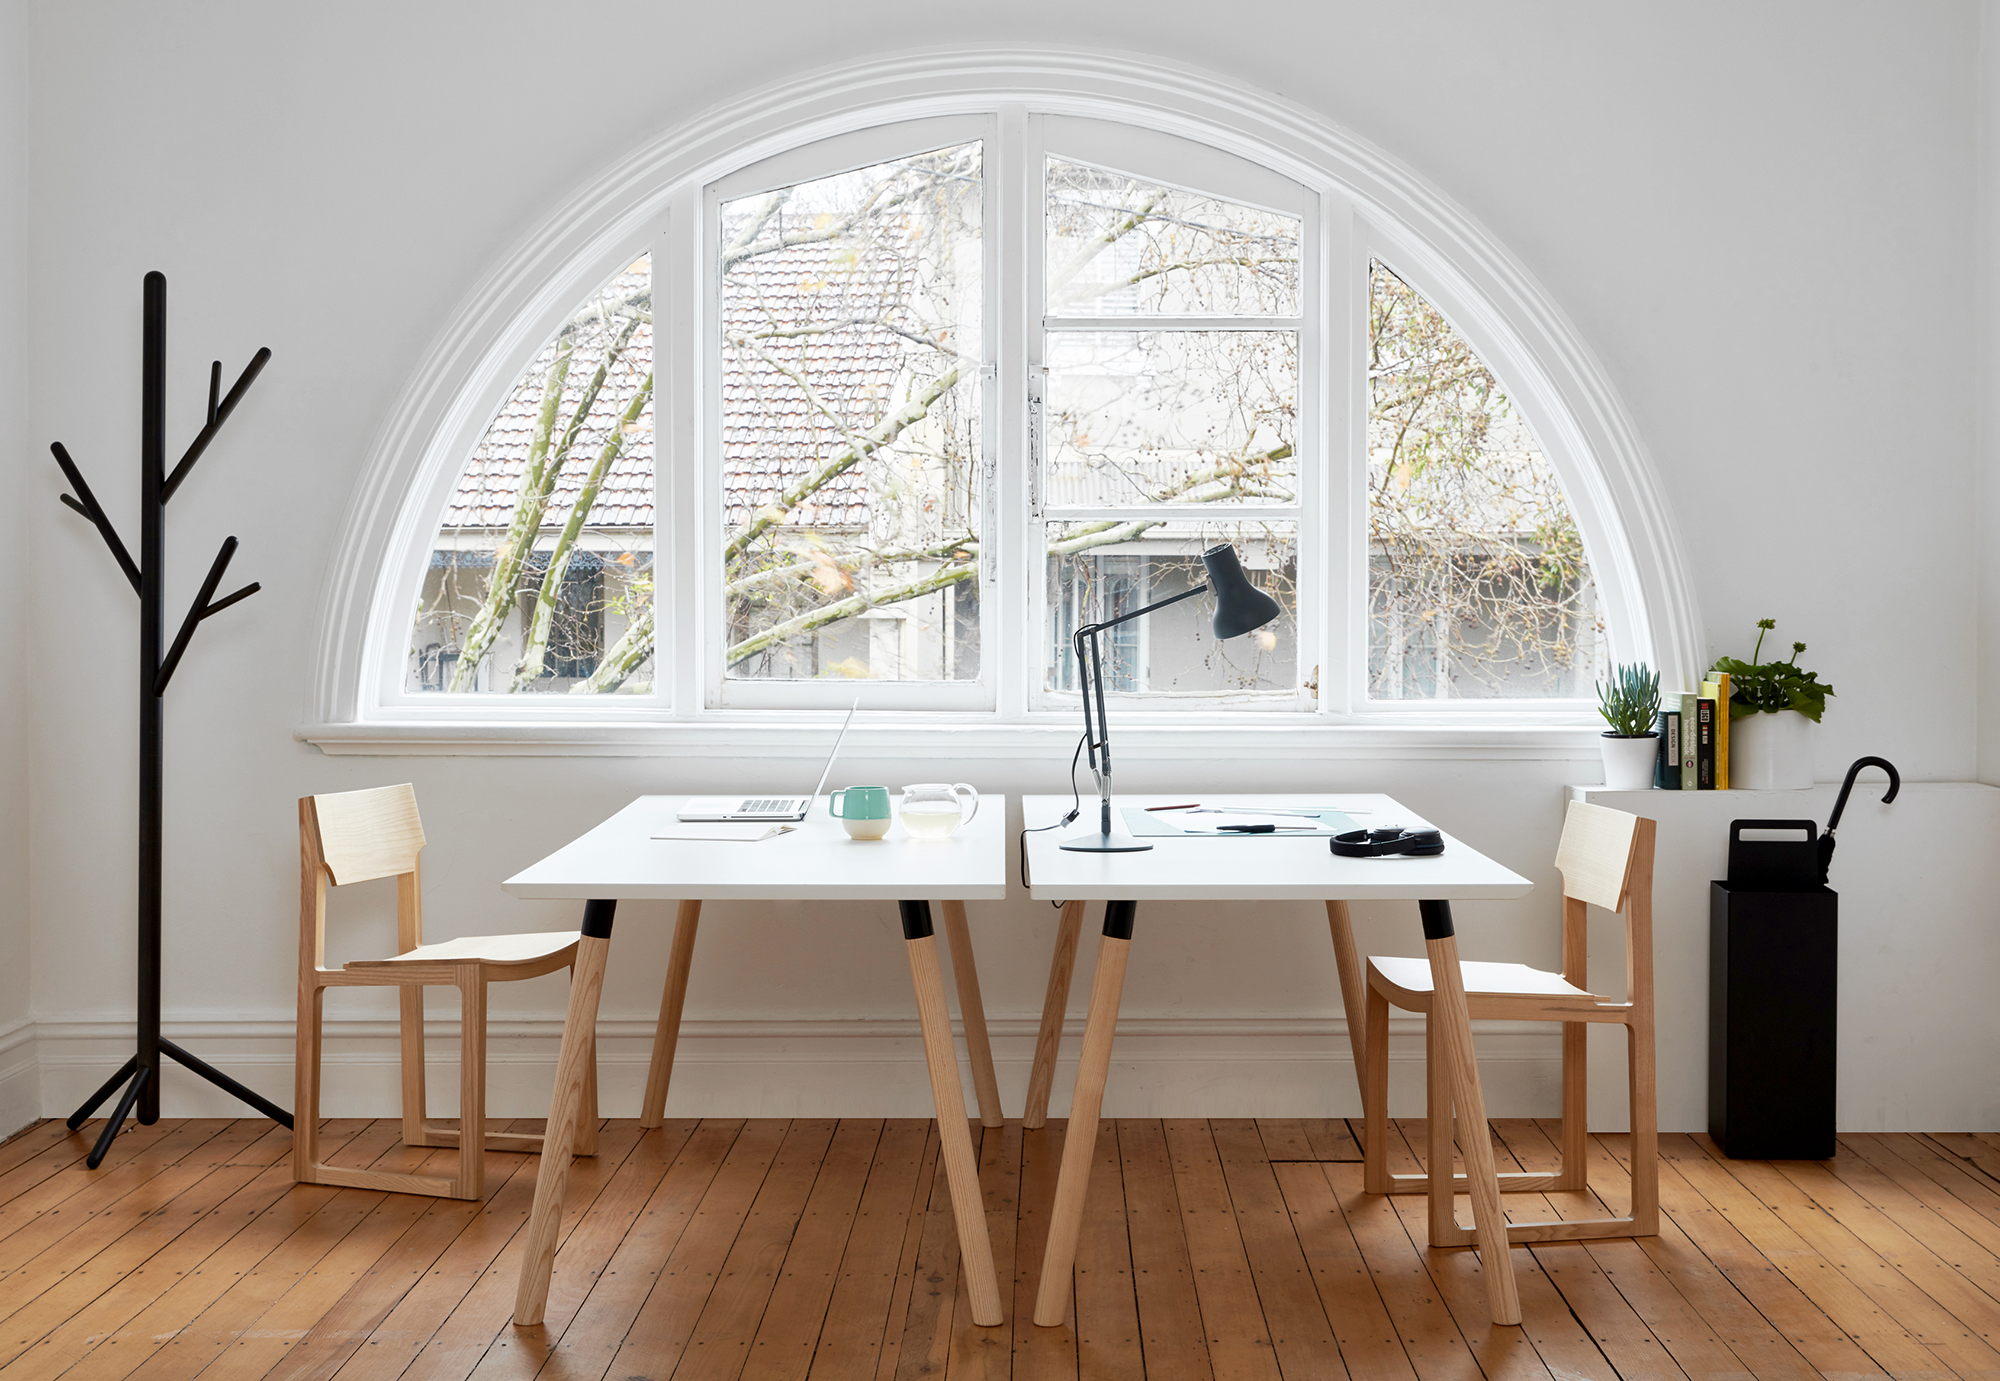 Partridge Desk Bedside Table Design Laminate Table Top White